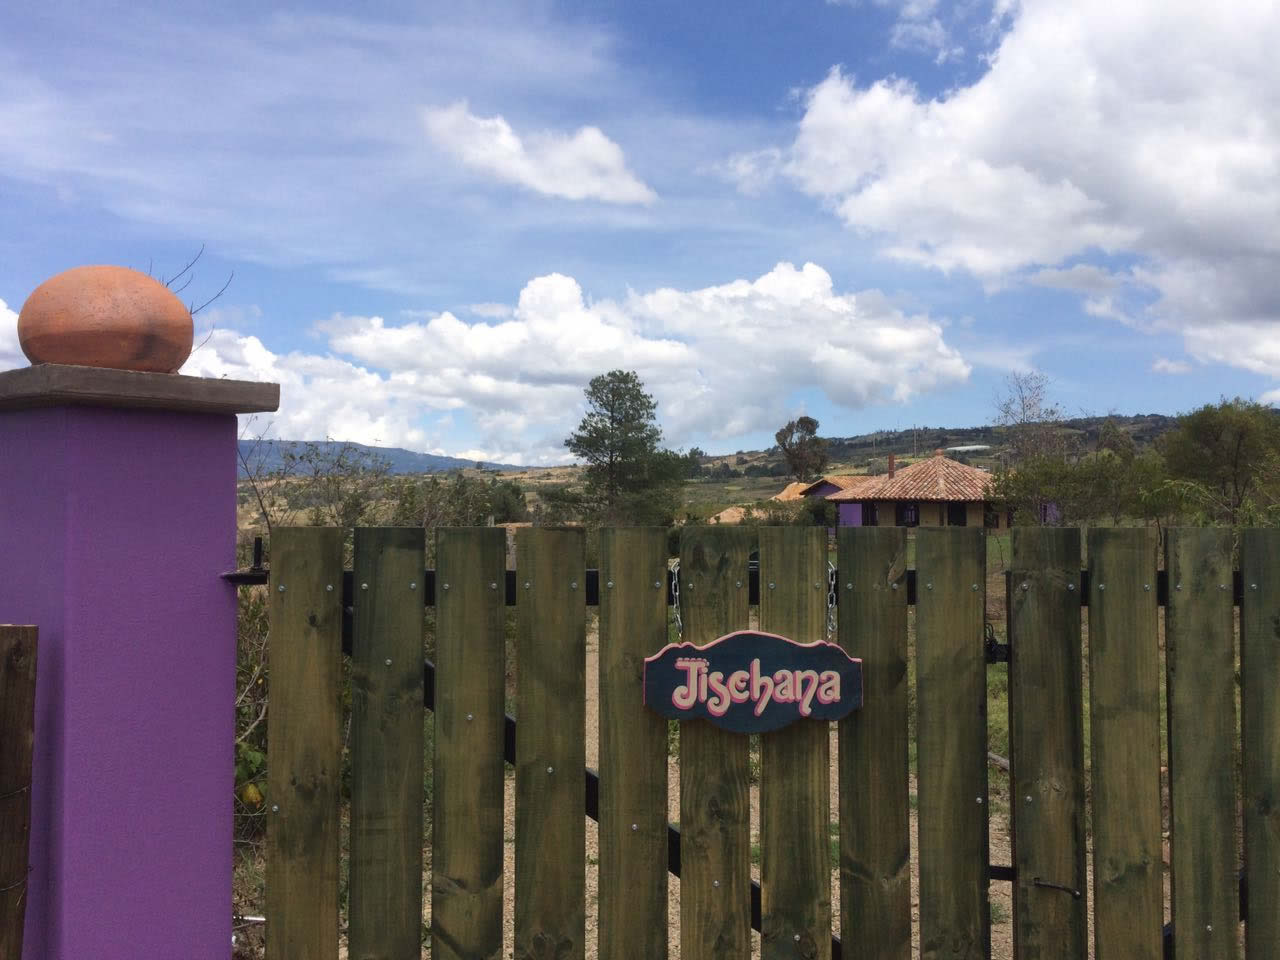 Alquiler casa Jishana Villa de Leyva - Entrada